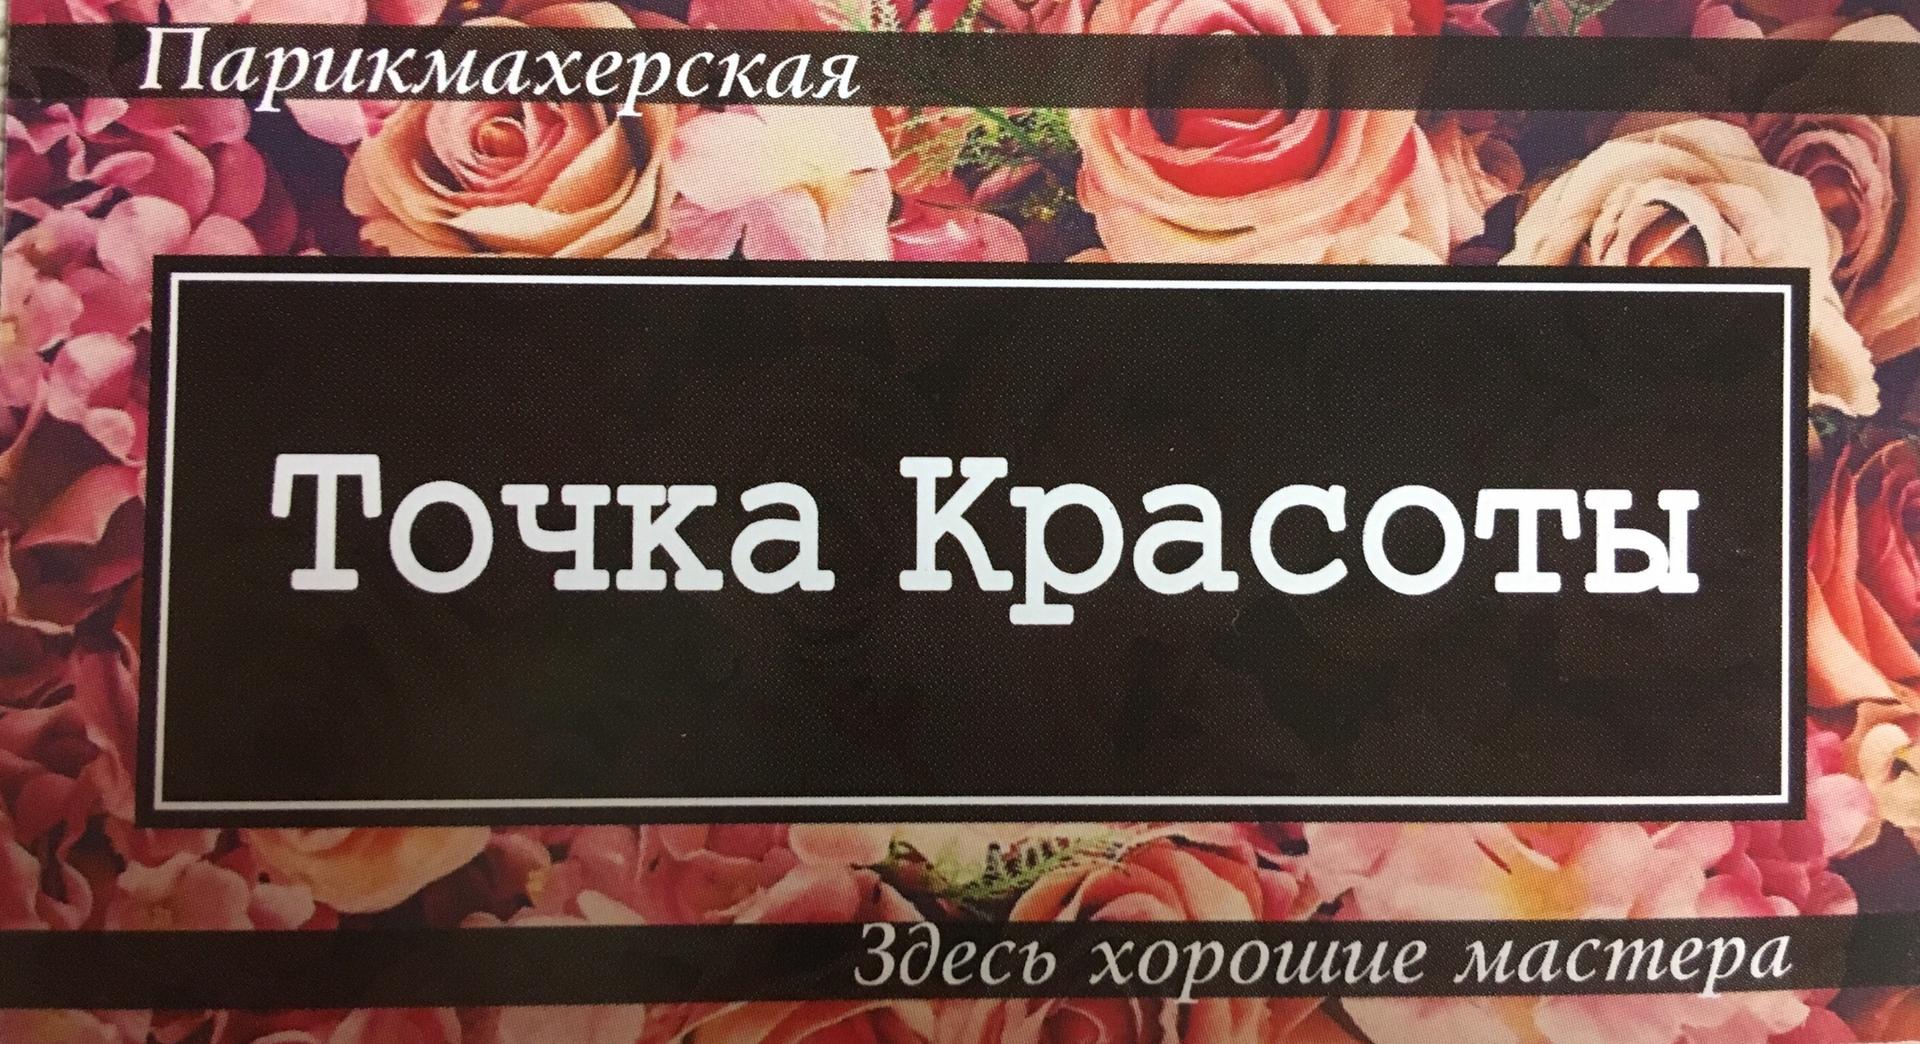 Елена Волгина